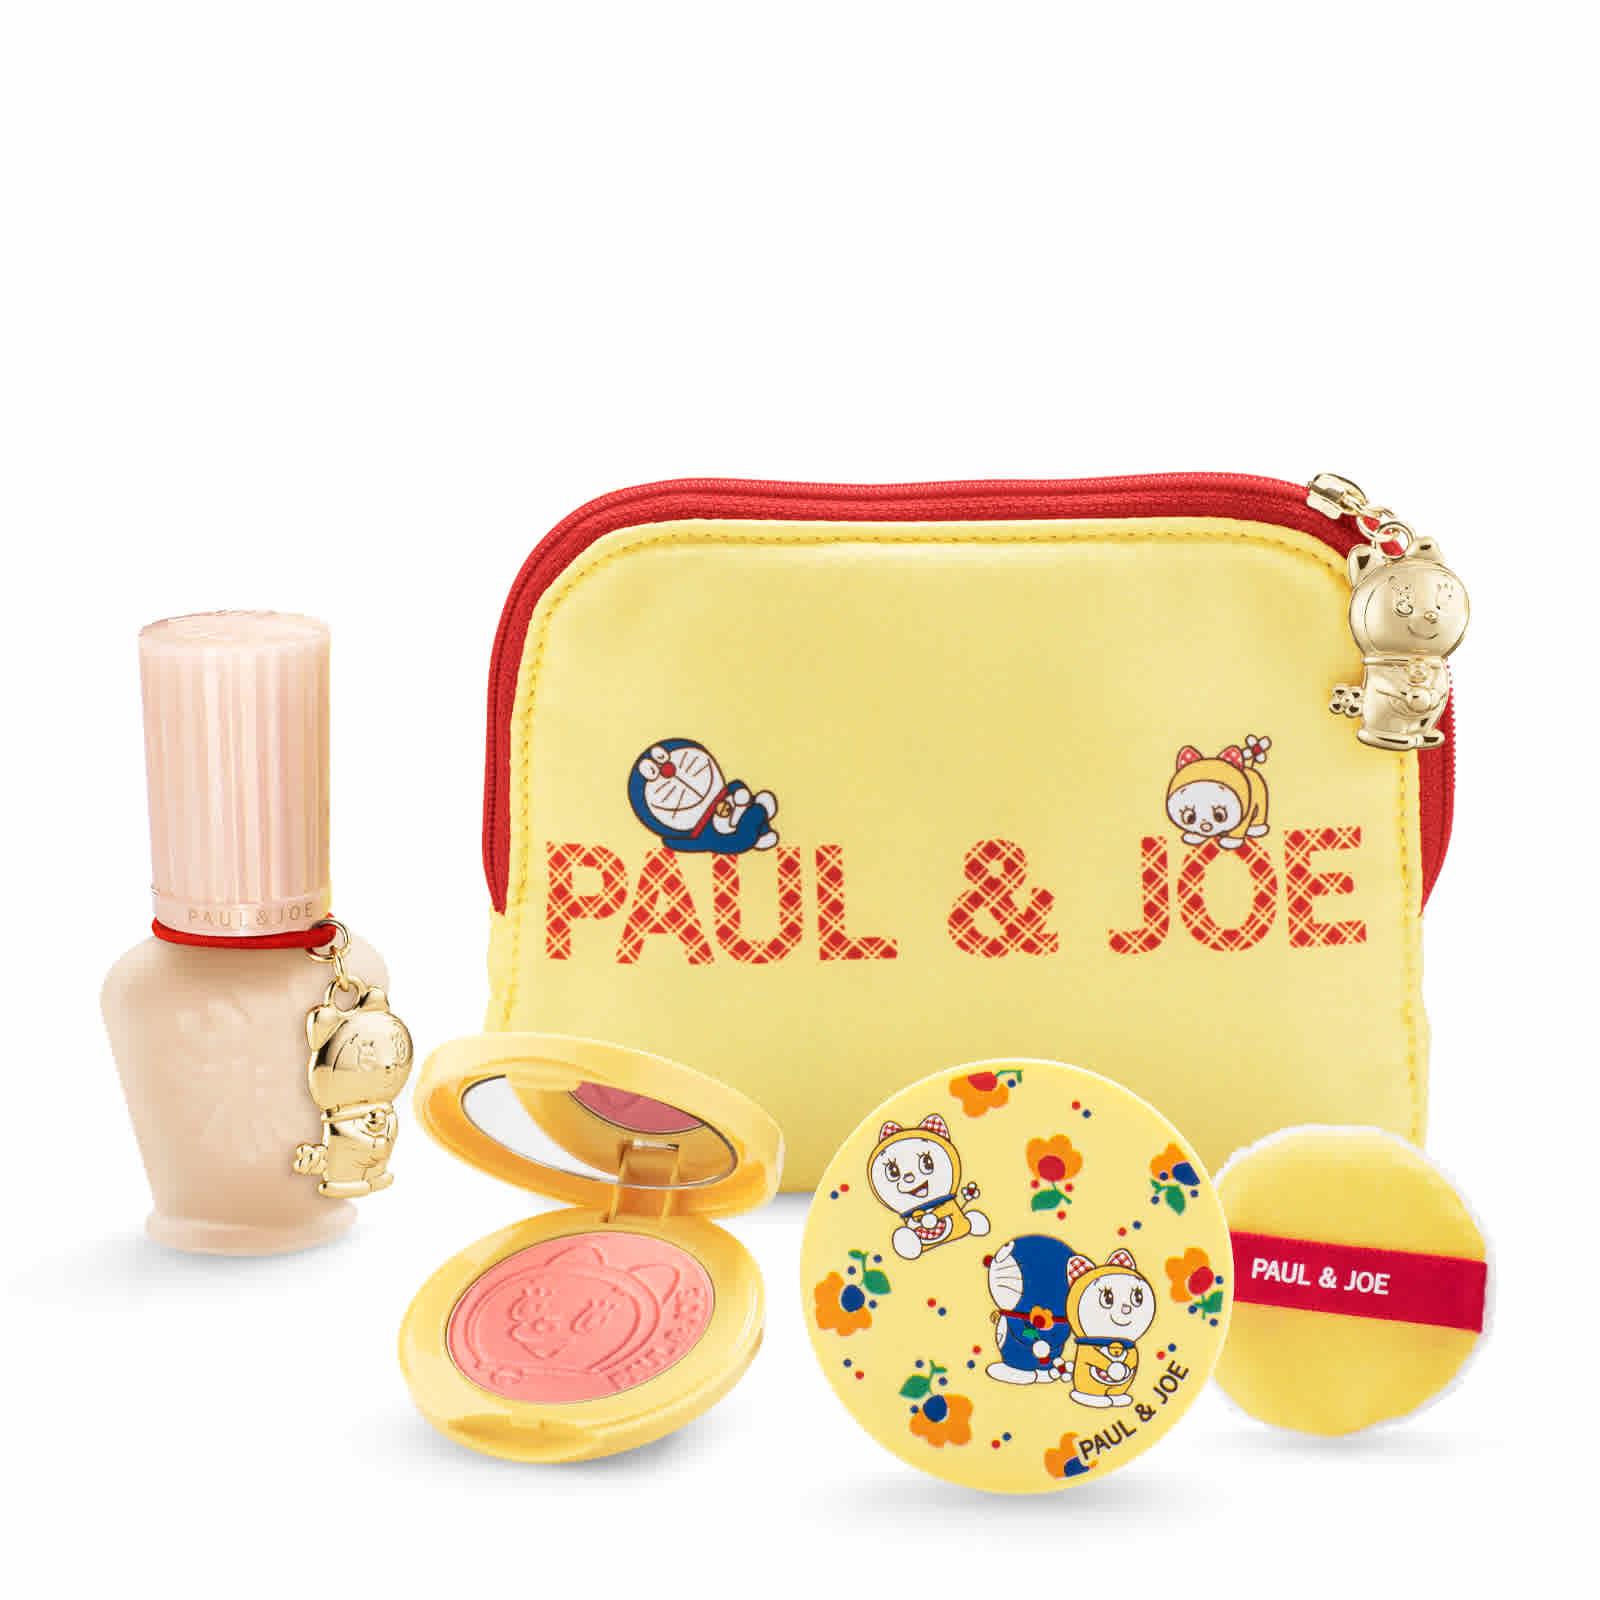 Paul Joe Doraemon And Dorami Makeup